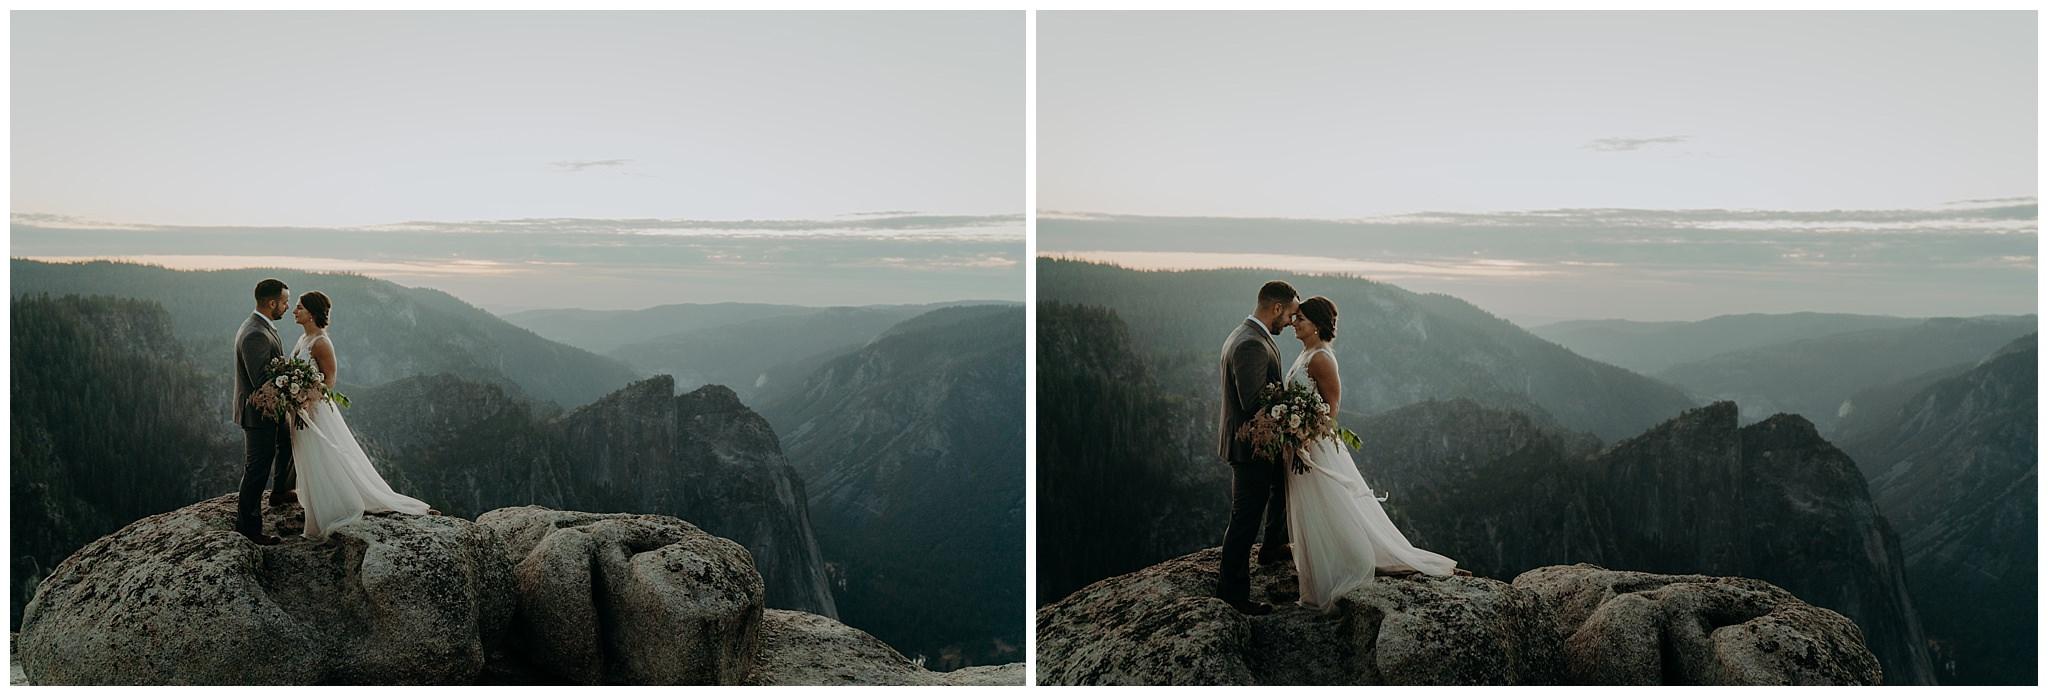 yosemite-national-park-wedding9.jpg